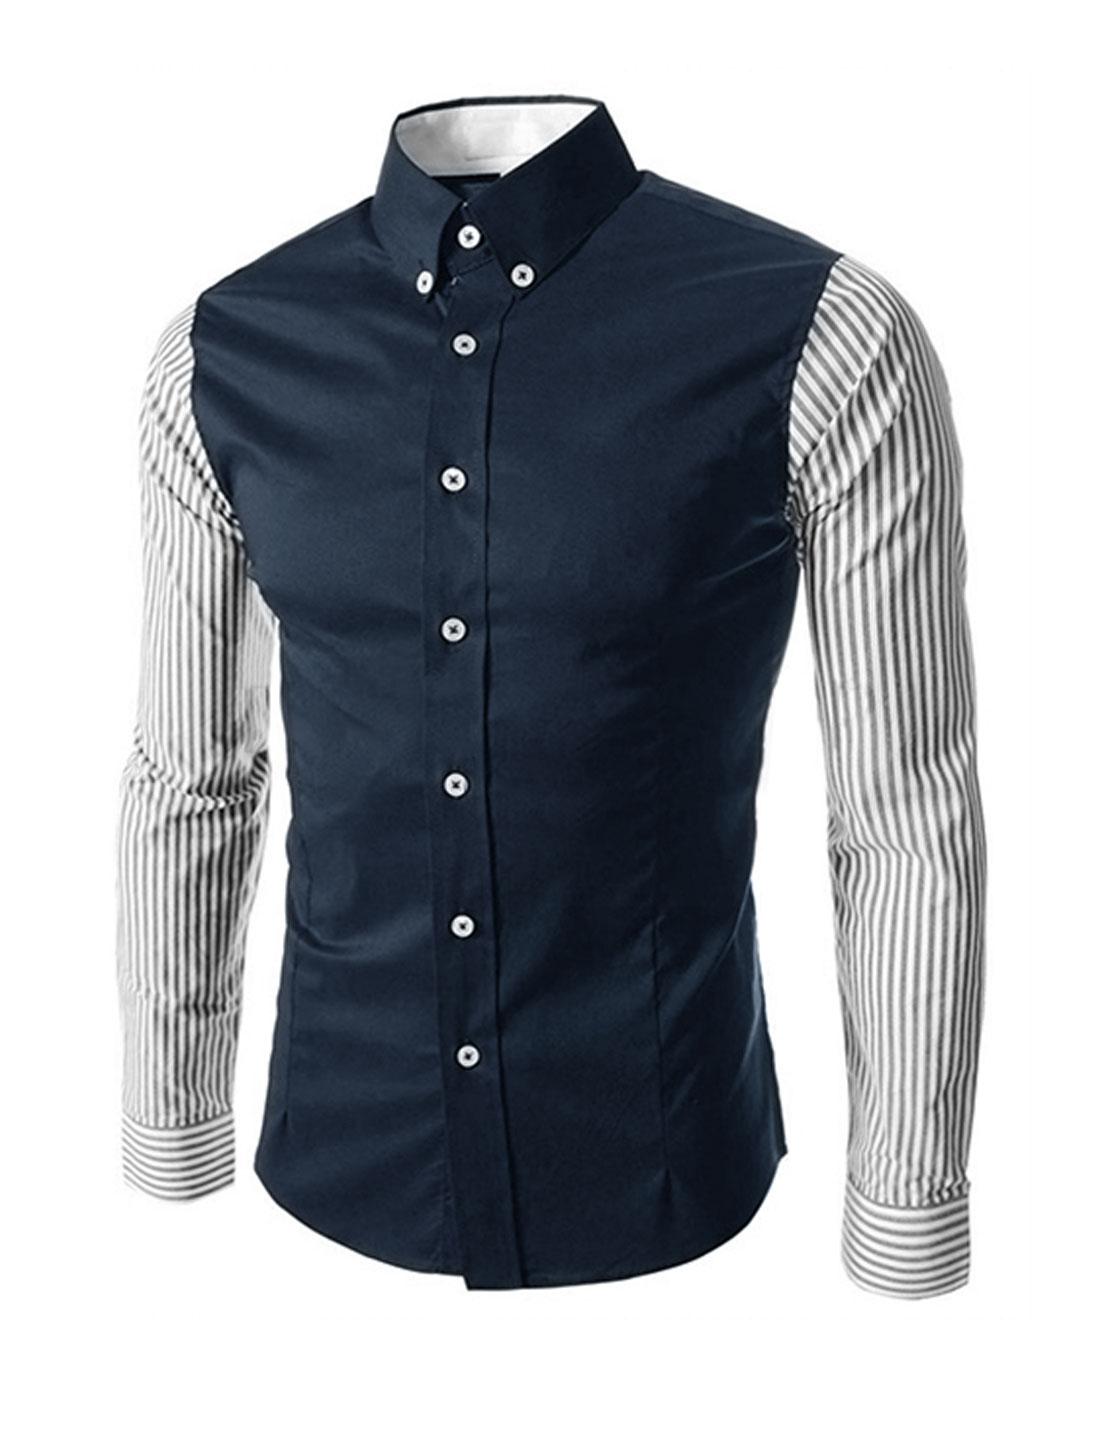 Man Point Collar Long Sleeves Stripes Button Down Shirts Navy Blue M